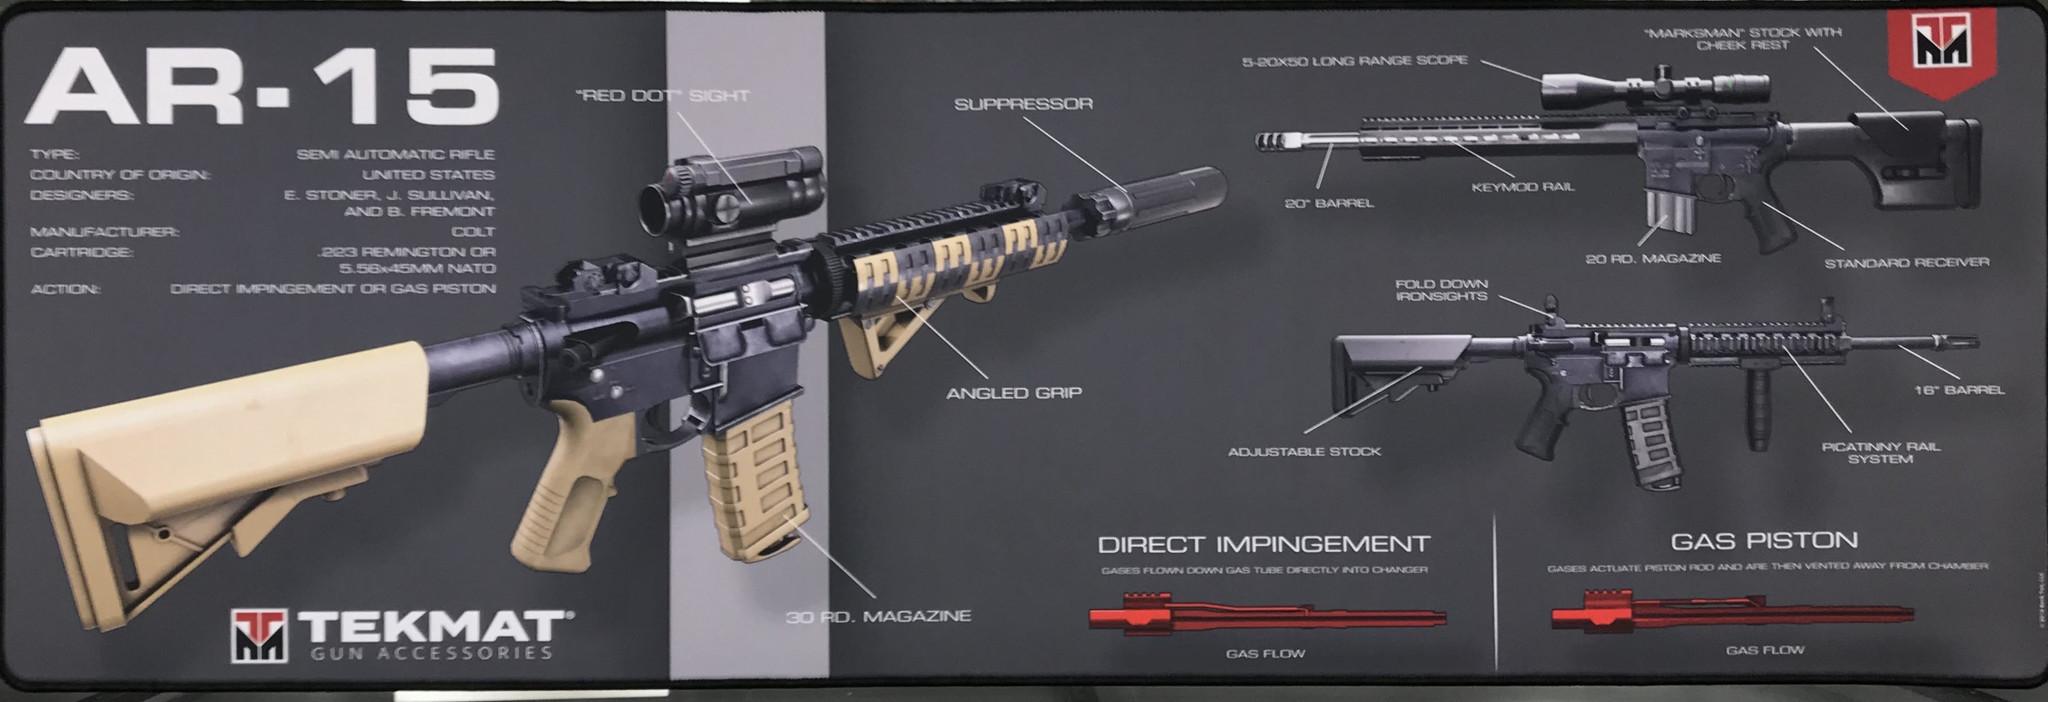 TekMat Firearms Cleaning Mat AR15 Diagram (14x44)